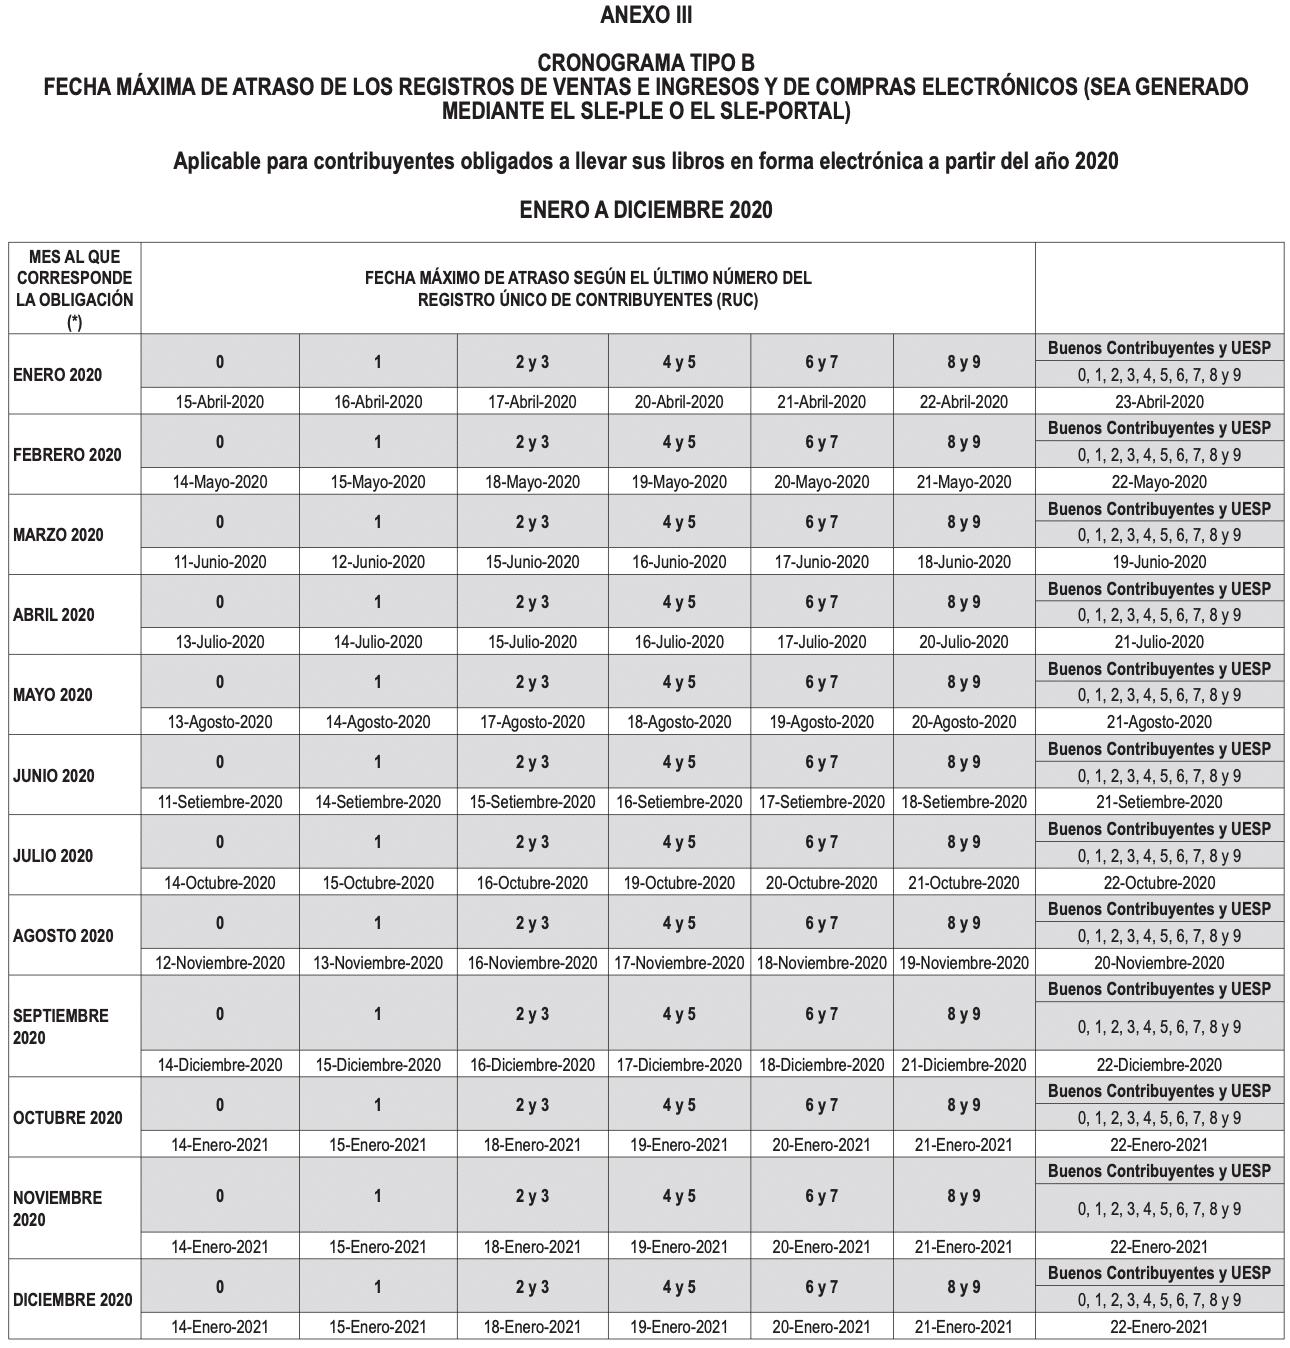 Cronograma Tipo B Libros Electrónicos 2020